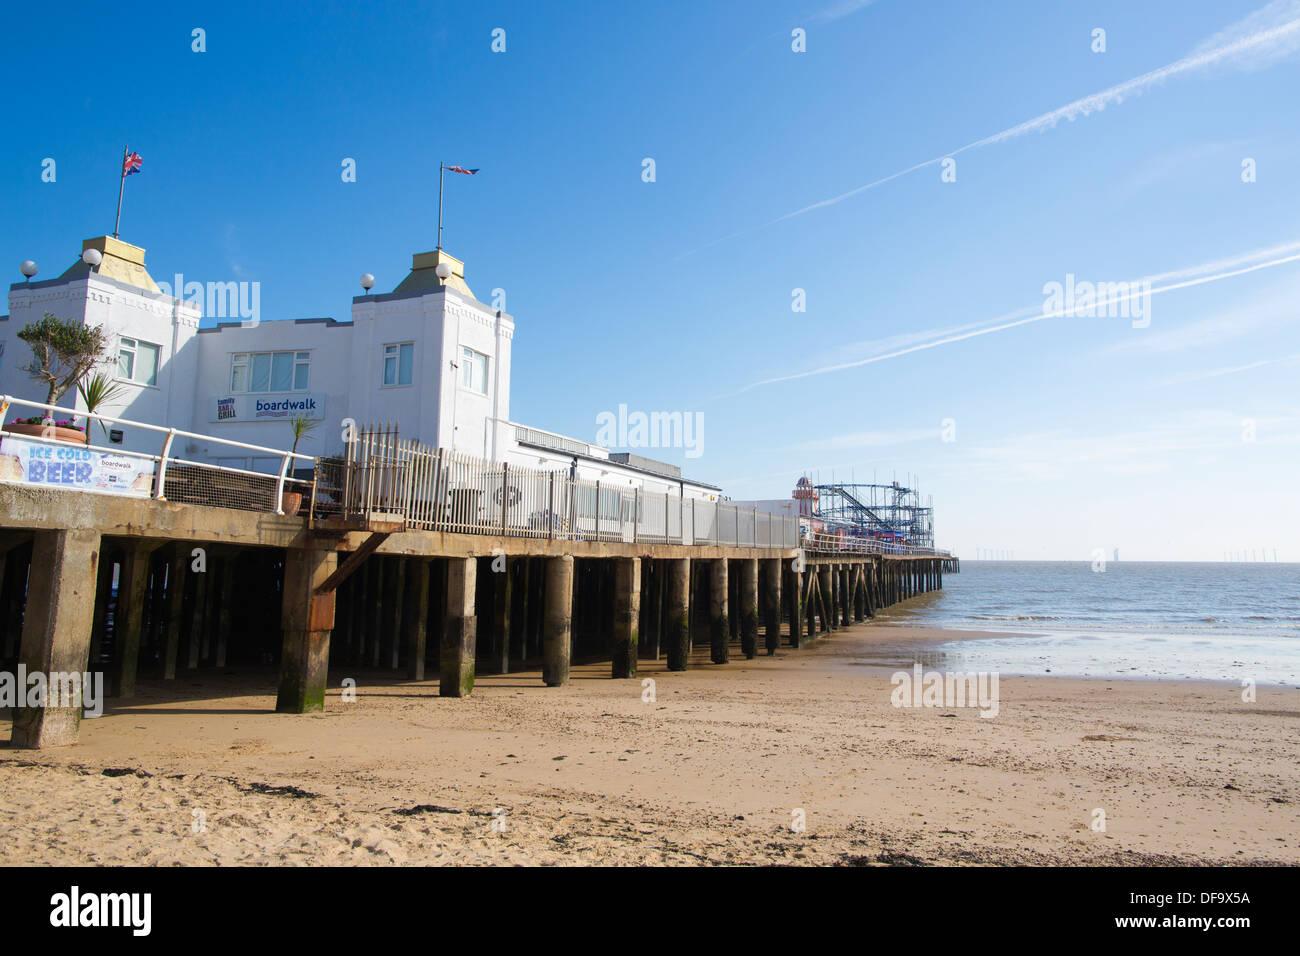 Clacton-on-Sea Pier, Clacton-on-Sea, Essex - Stock Image